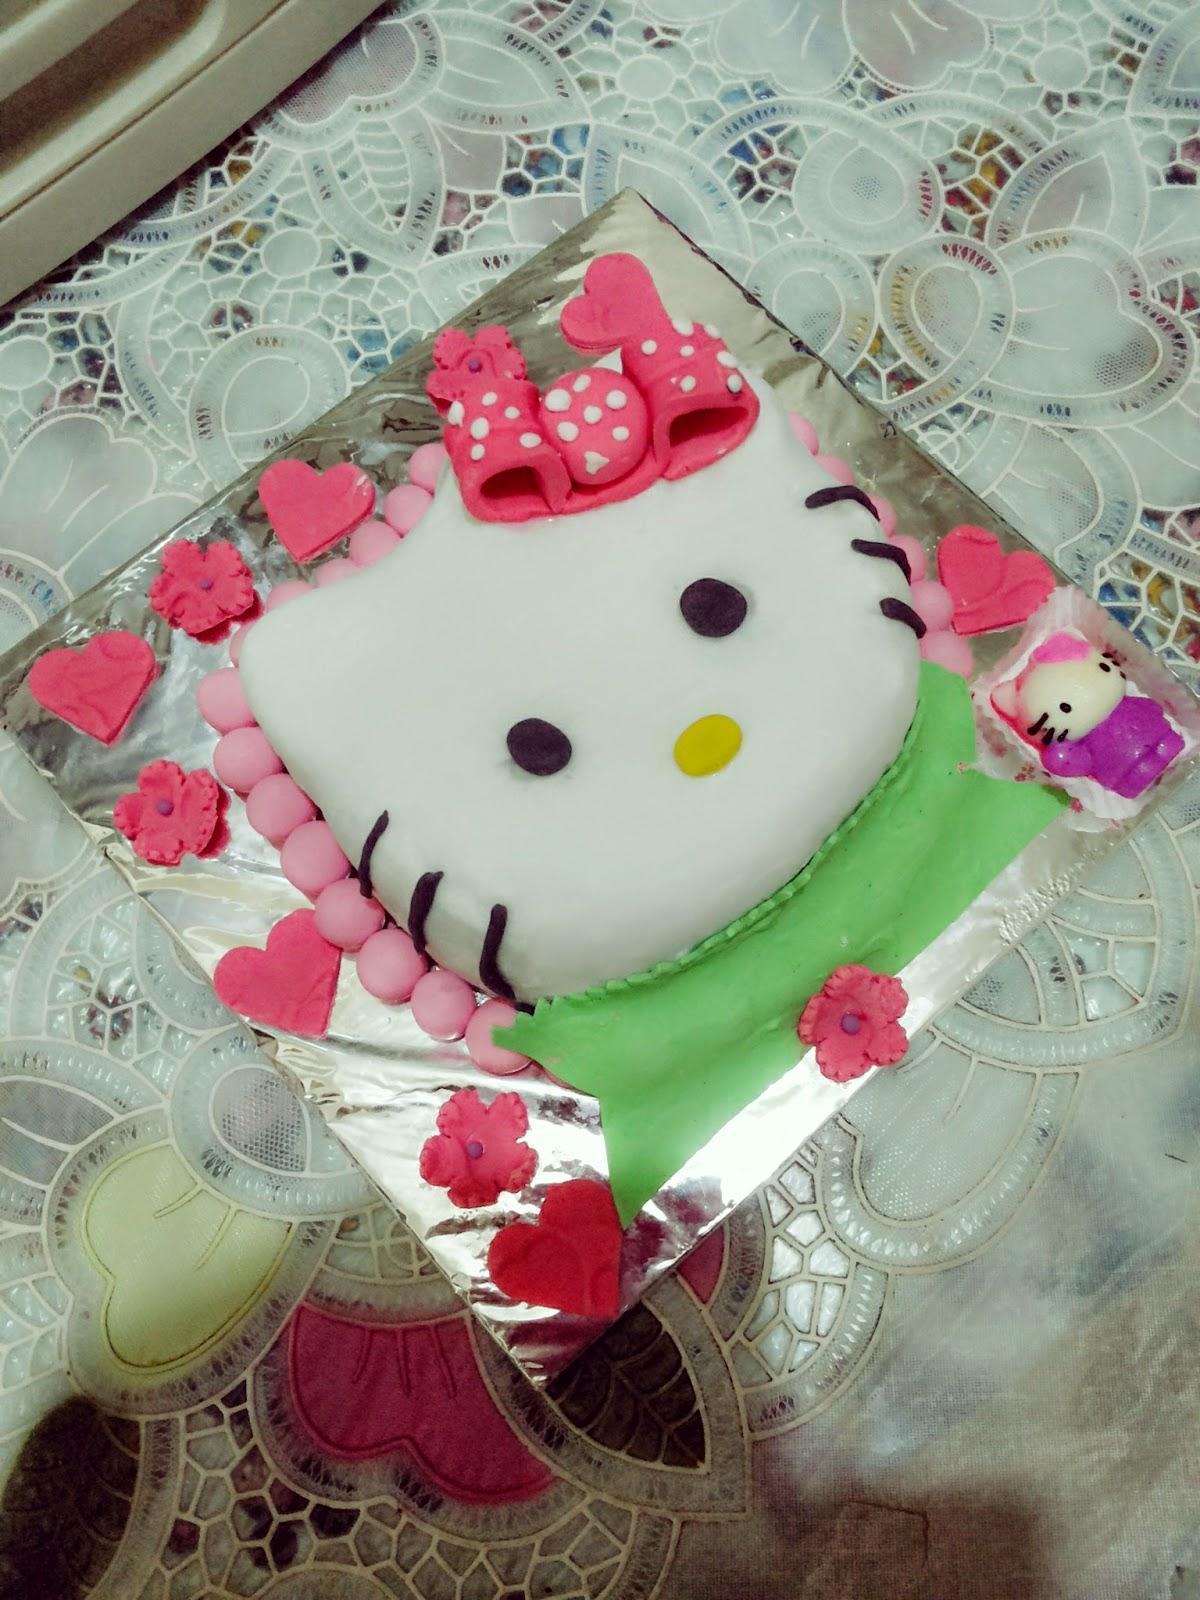 Sagitarius Cake Shop Kue Ulang Tahun Kepala Hello Kitty